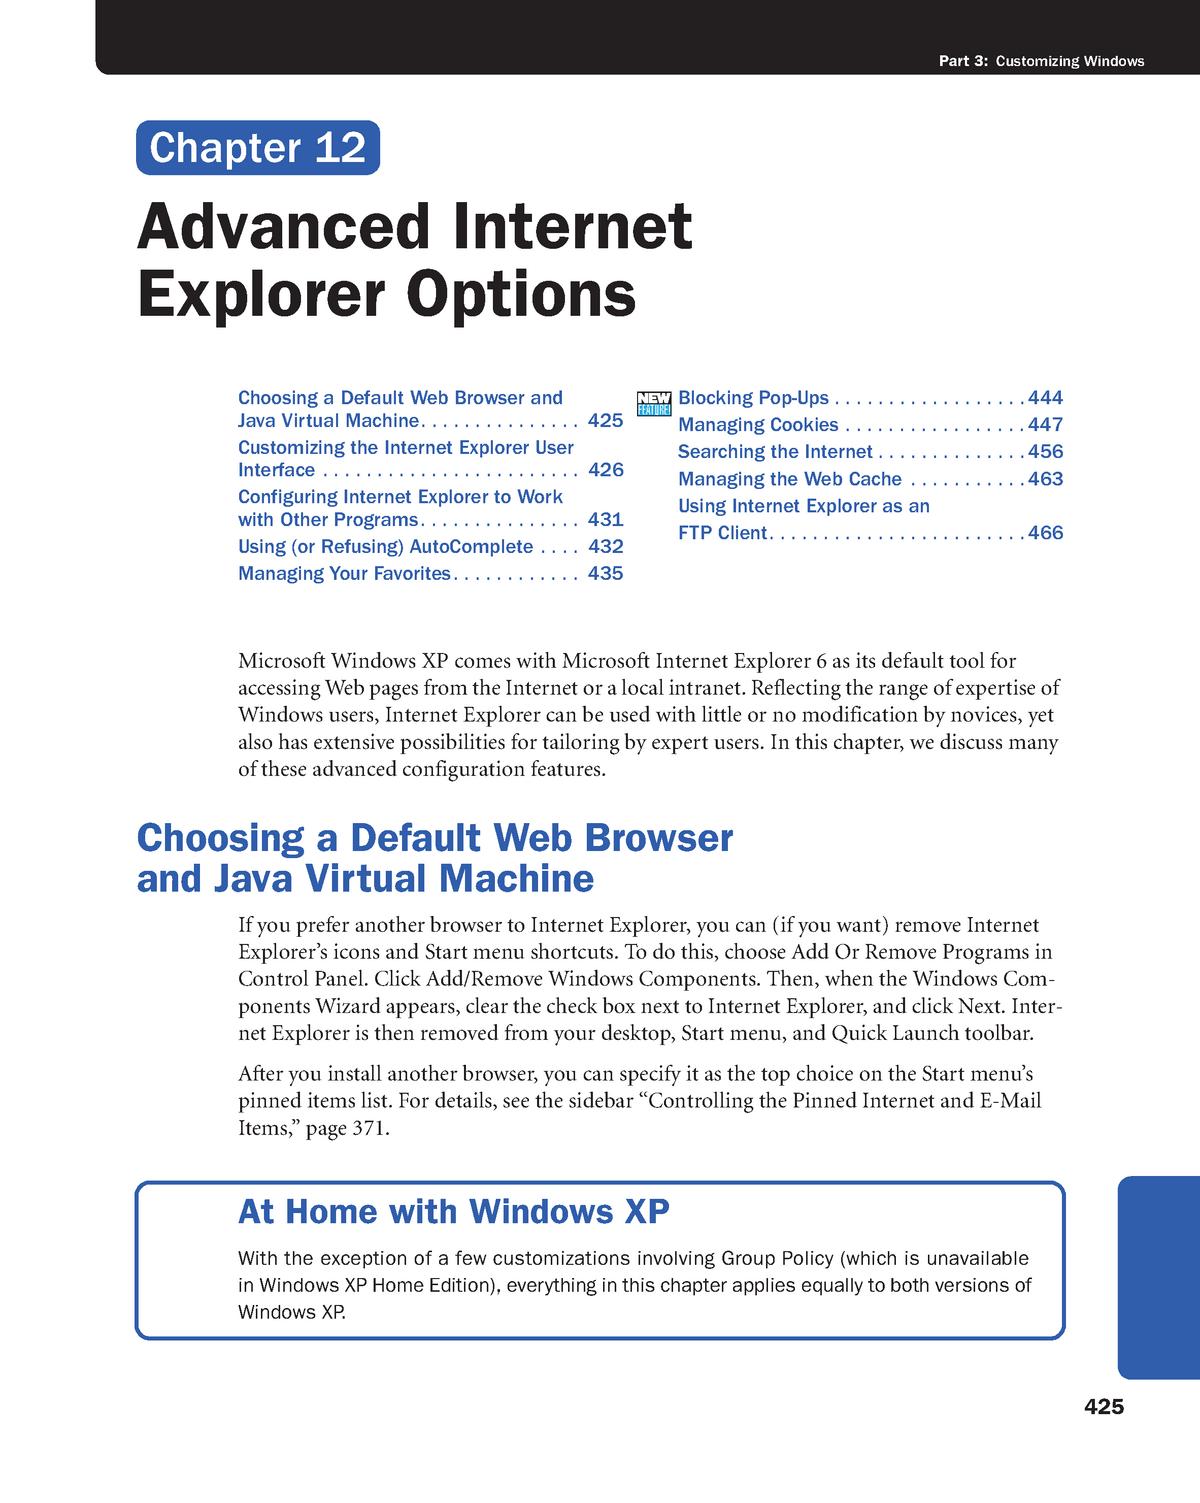 Chapter 12 - Advanced Internet Explorer Options - Principles of